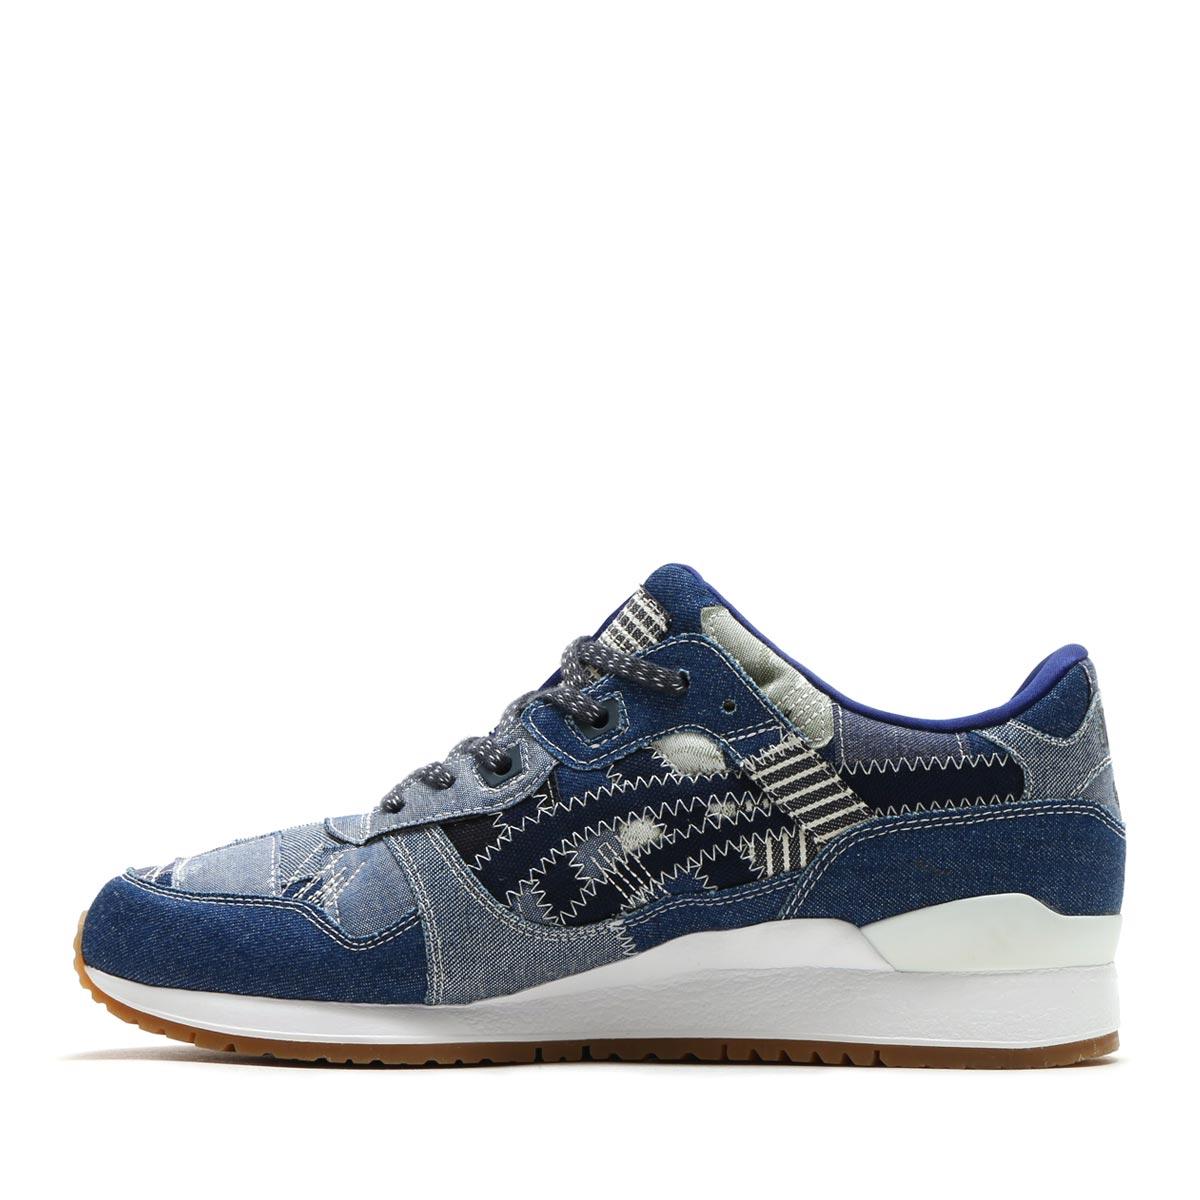 asics tiger gel-lyte ii ranru pack indigo blue 5